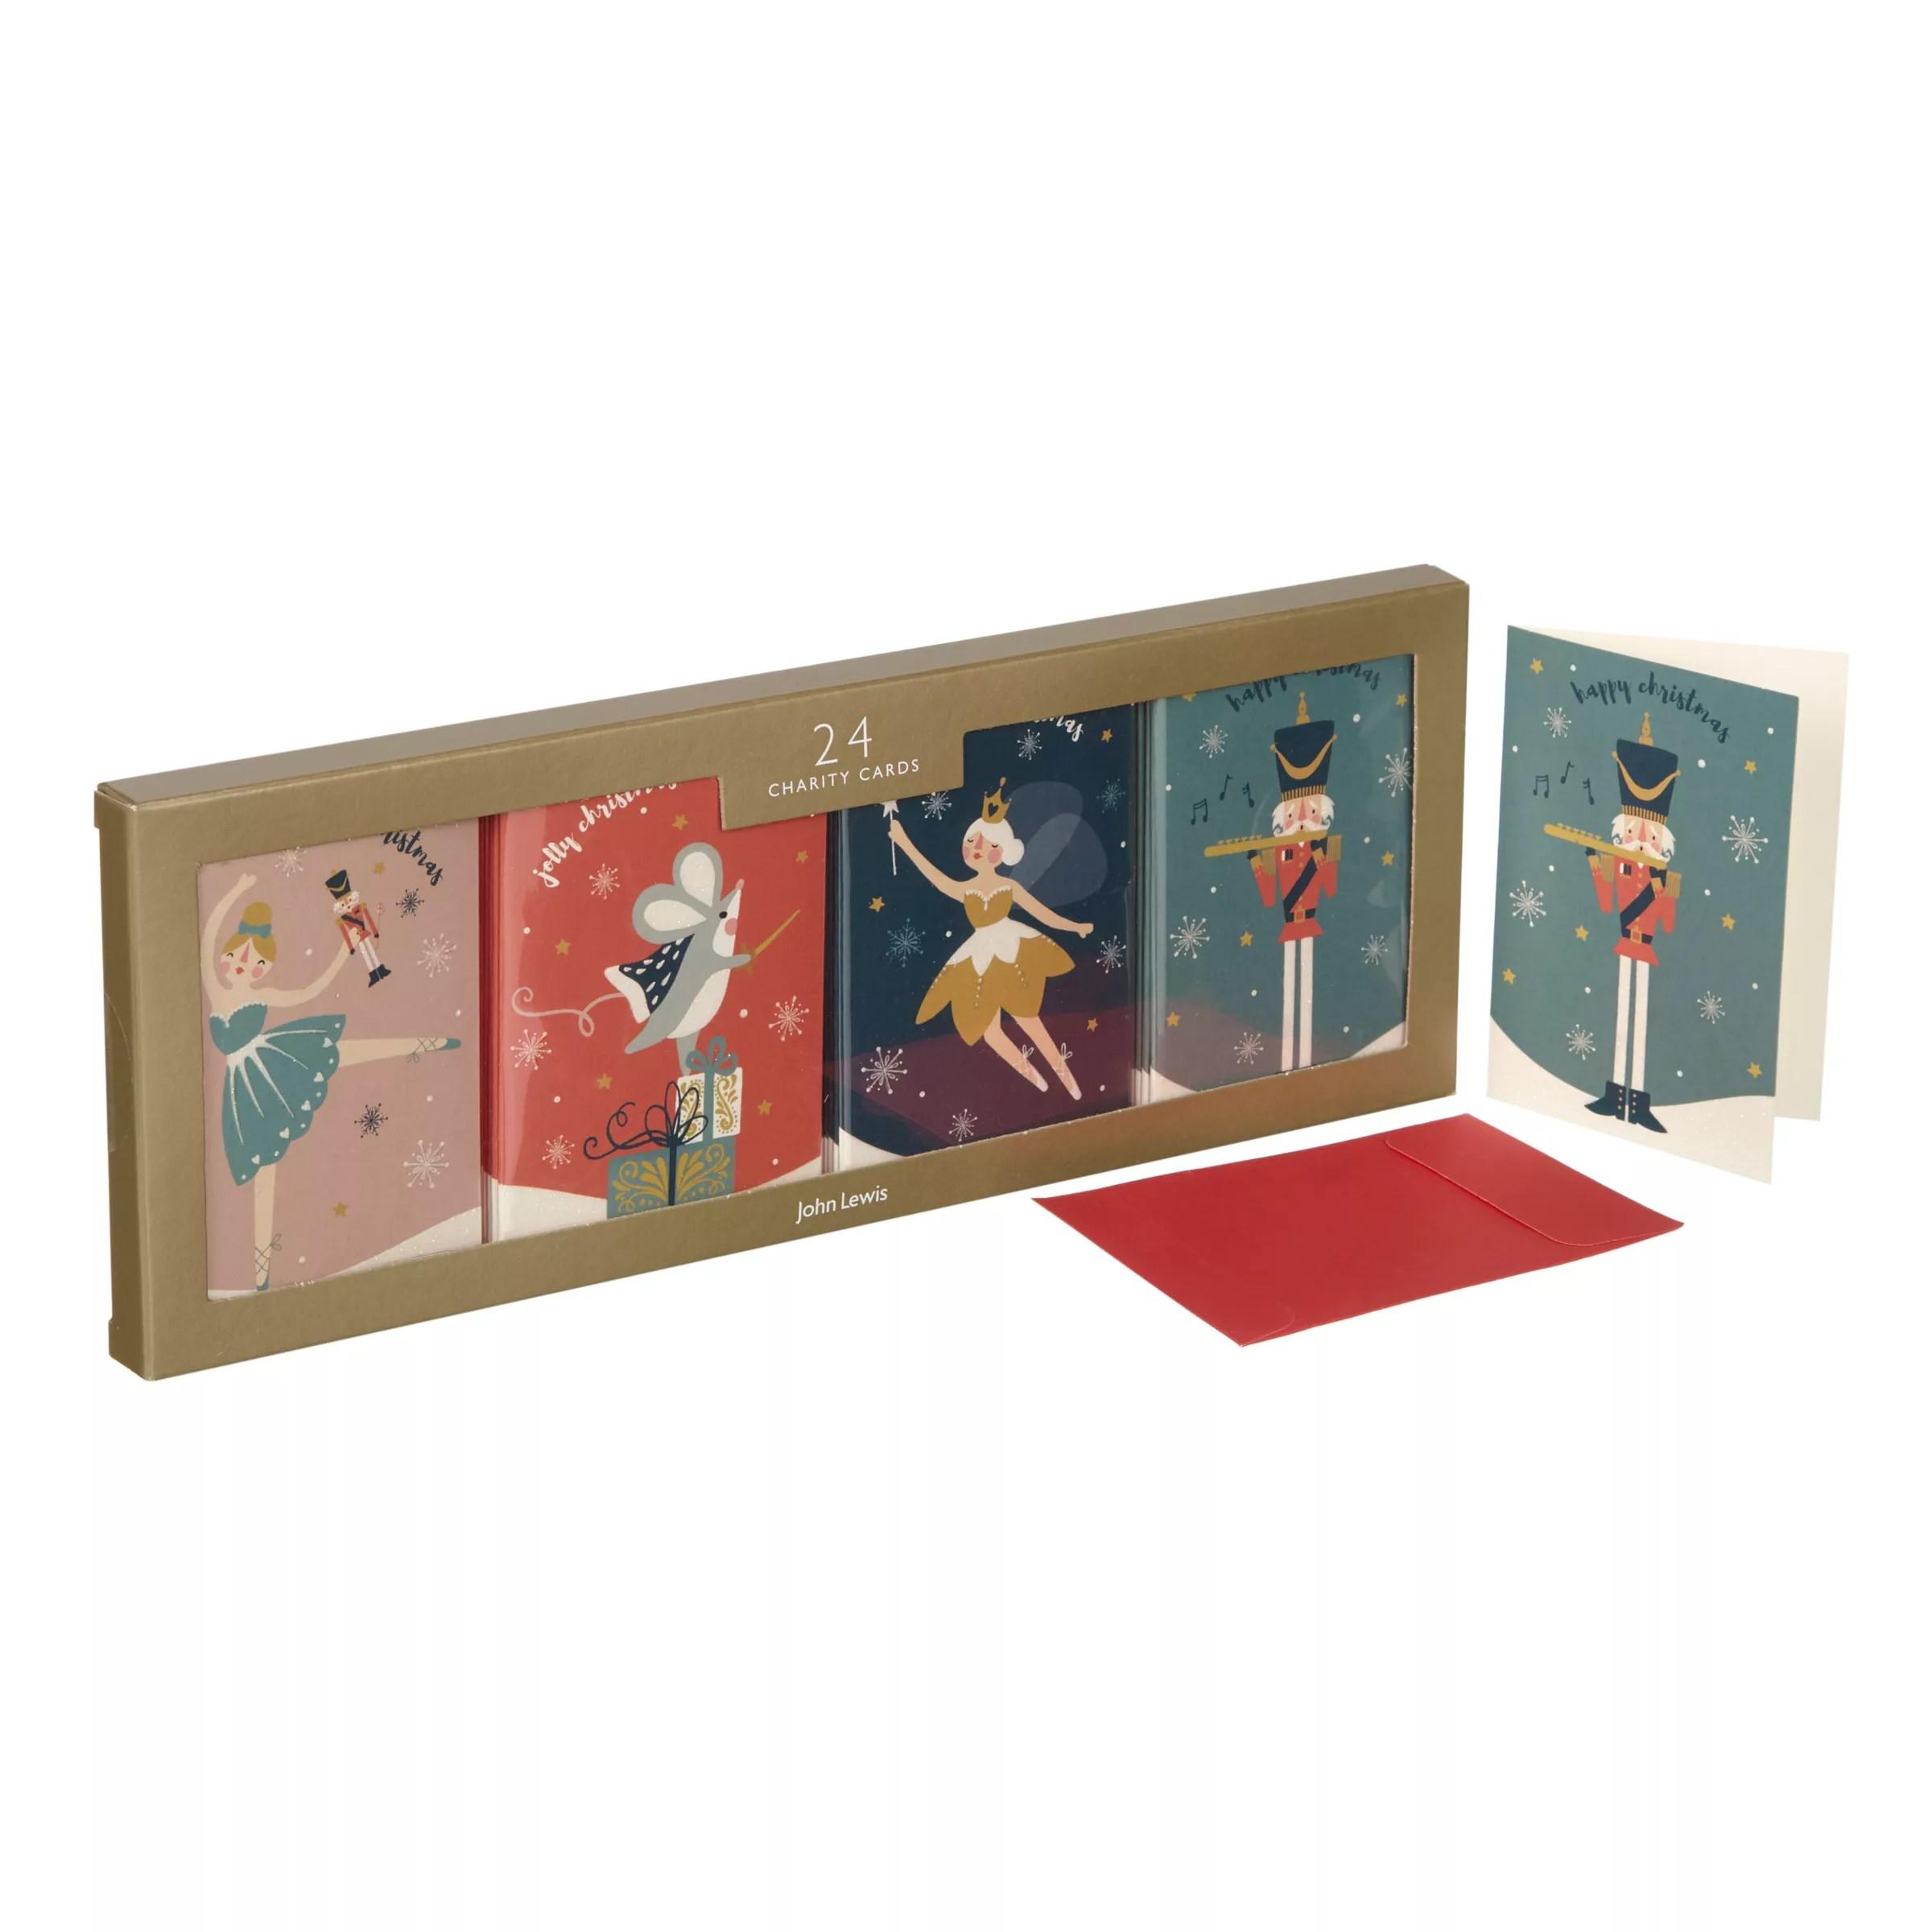 John Lewis Nutcracker Mini Charity Christmas Card Pack Of